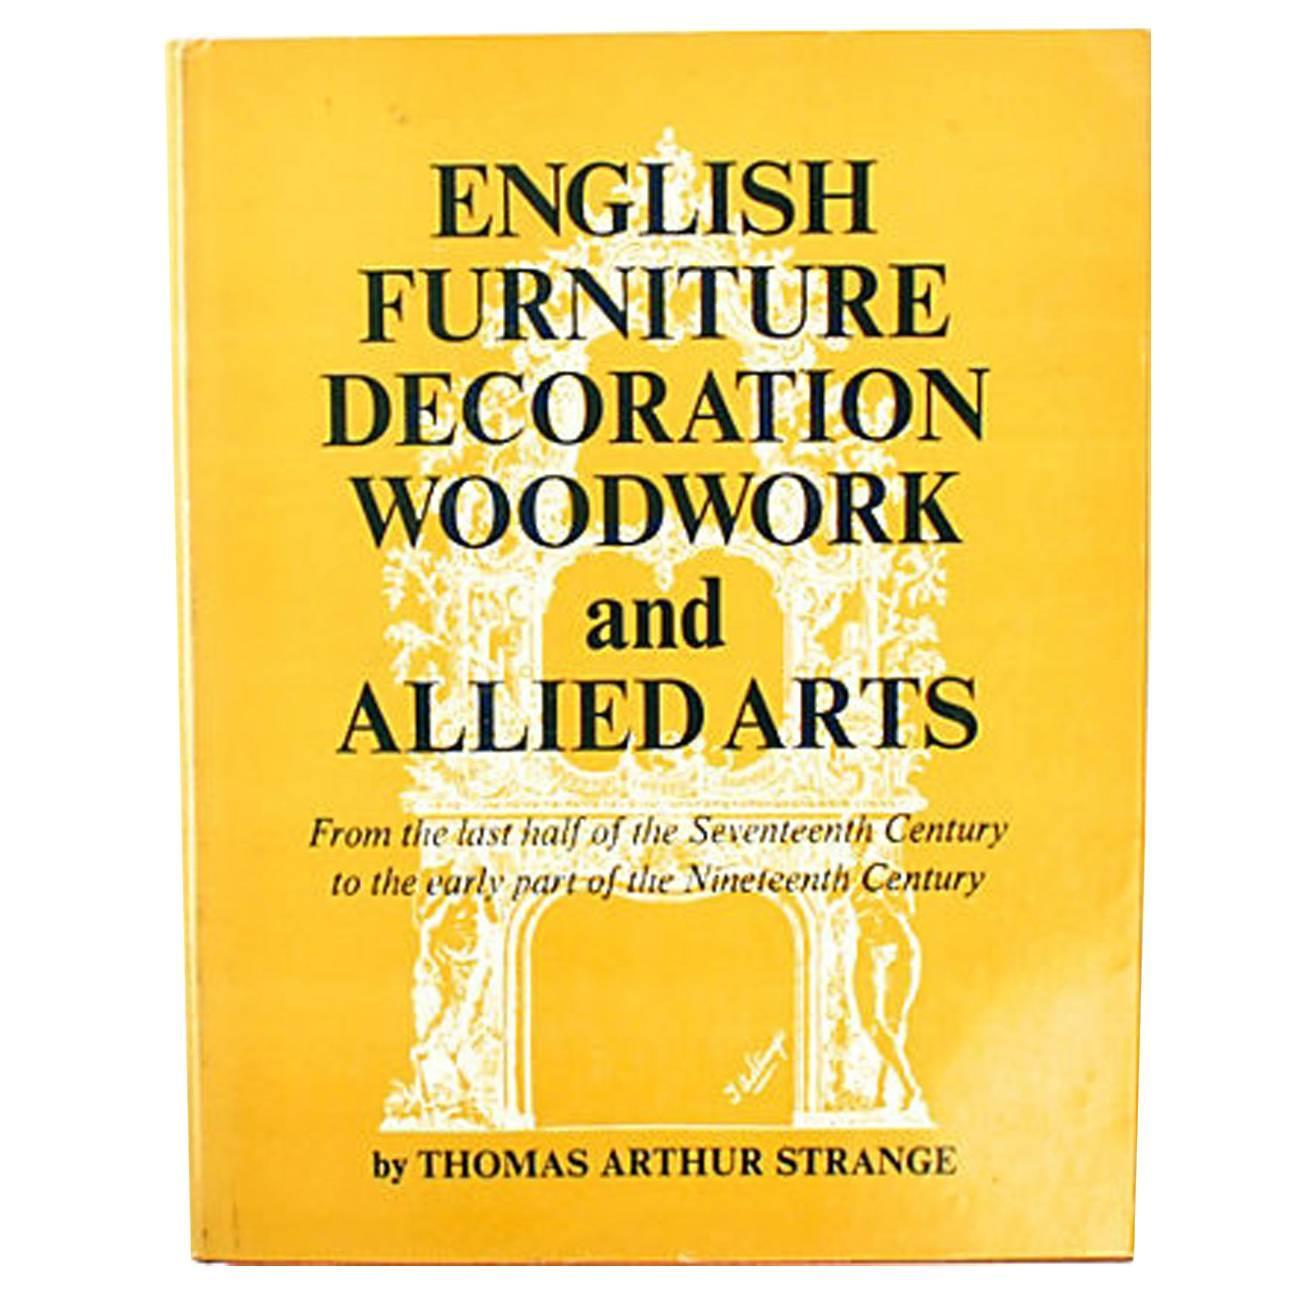 English Furniture Decoration and Allied Arts by Thomas Strange, 1st Ed